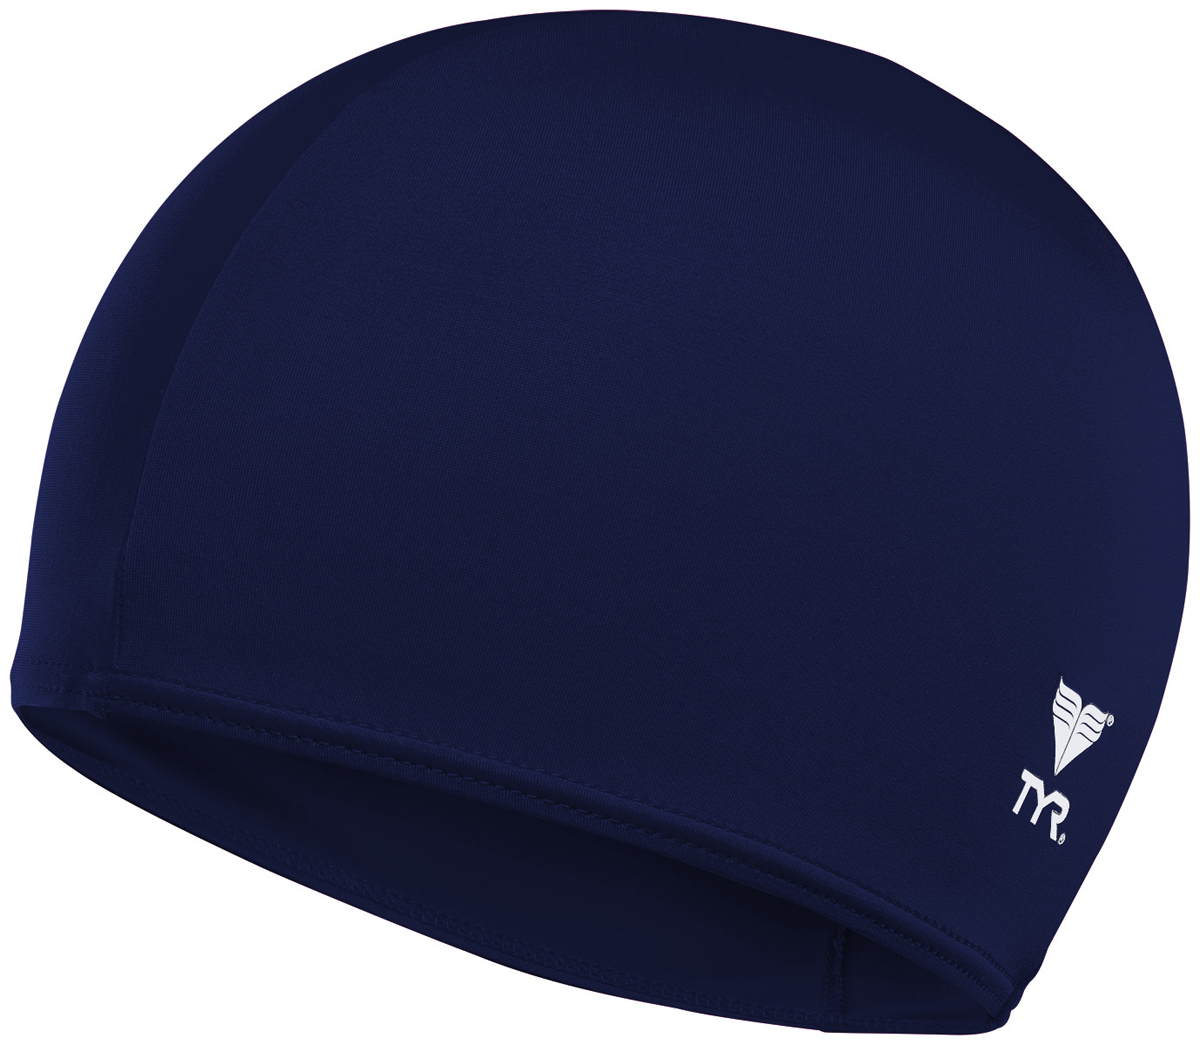 Шапочка для плавания Tyr Solid Lycra Cap, цвет: синий. LCY шапочка для плавания tyr tyr ty003duxit11